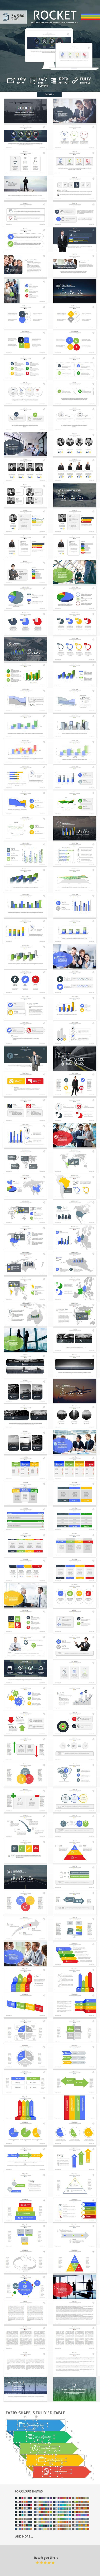 Rocket Powerpoint Presentation Template - Business PowerPoint Templates